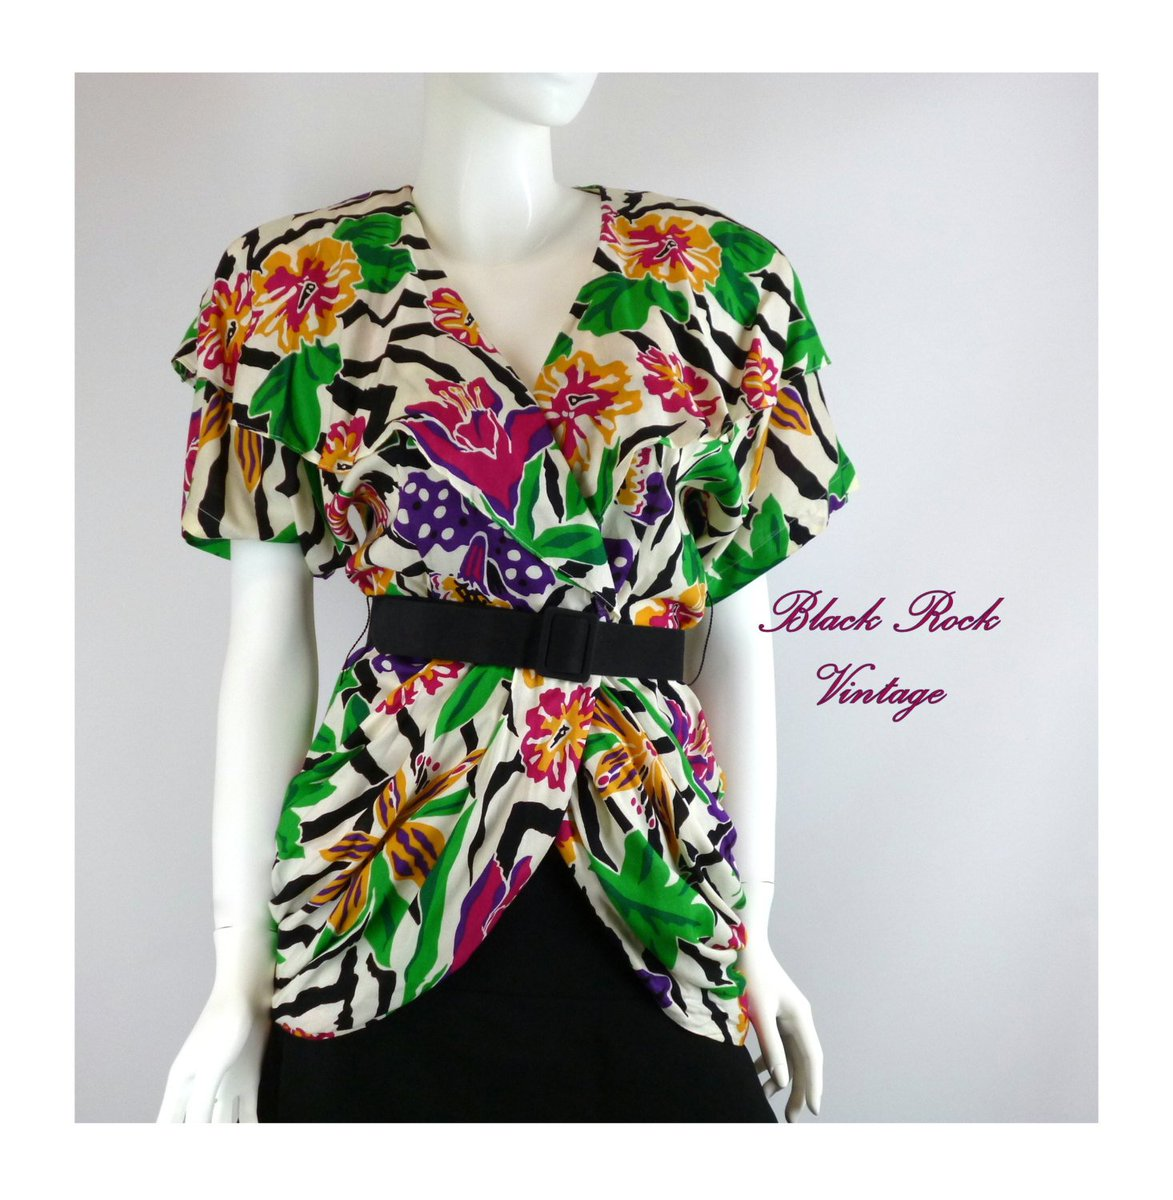 Floral Jacket Tropical Print, Jewel Tones Shawl Collar, Vintage 80… http://etsy.me/2rvVE76 #CheapChic #DrapedBlouse pic.twitter.com/Ahqa7FQwAs